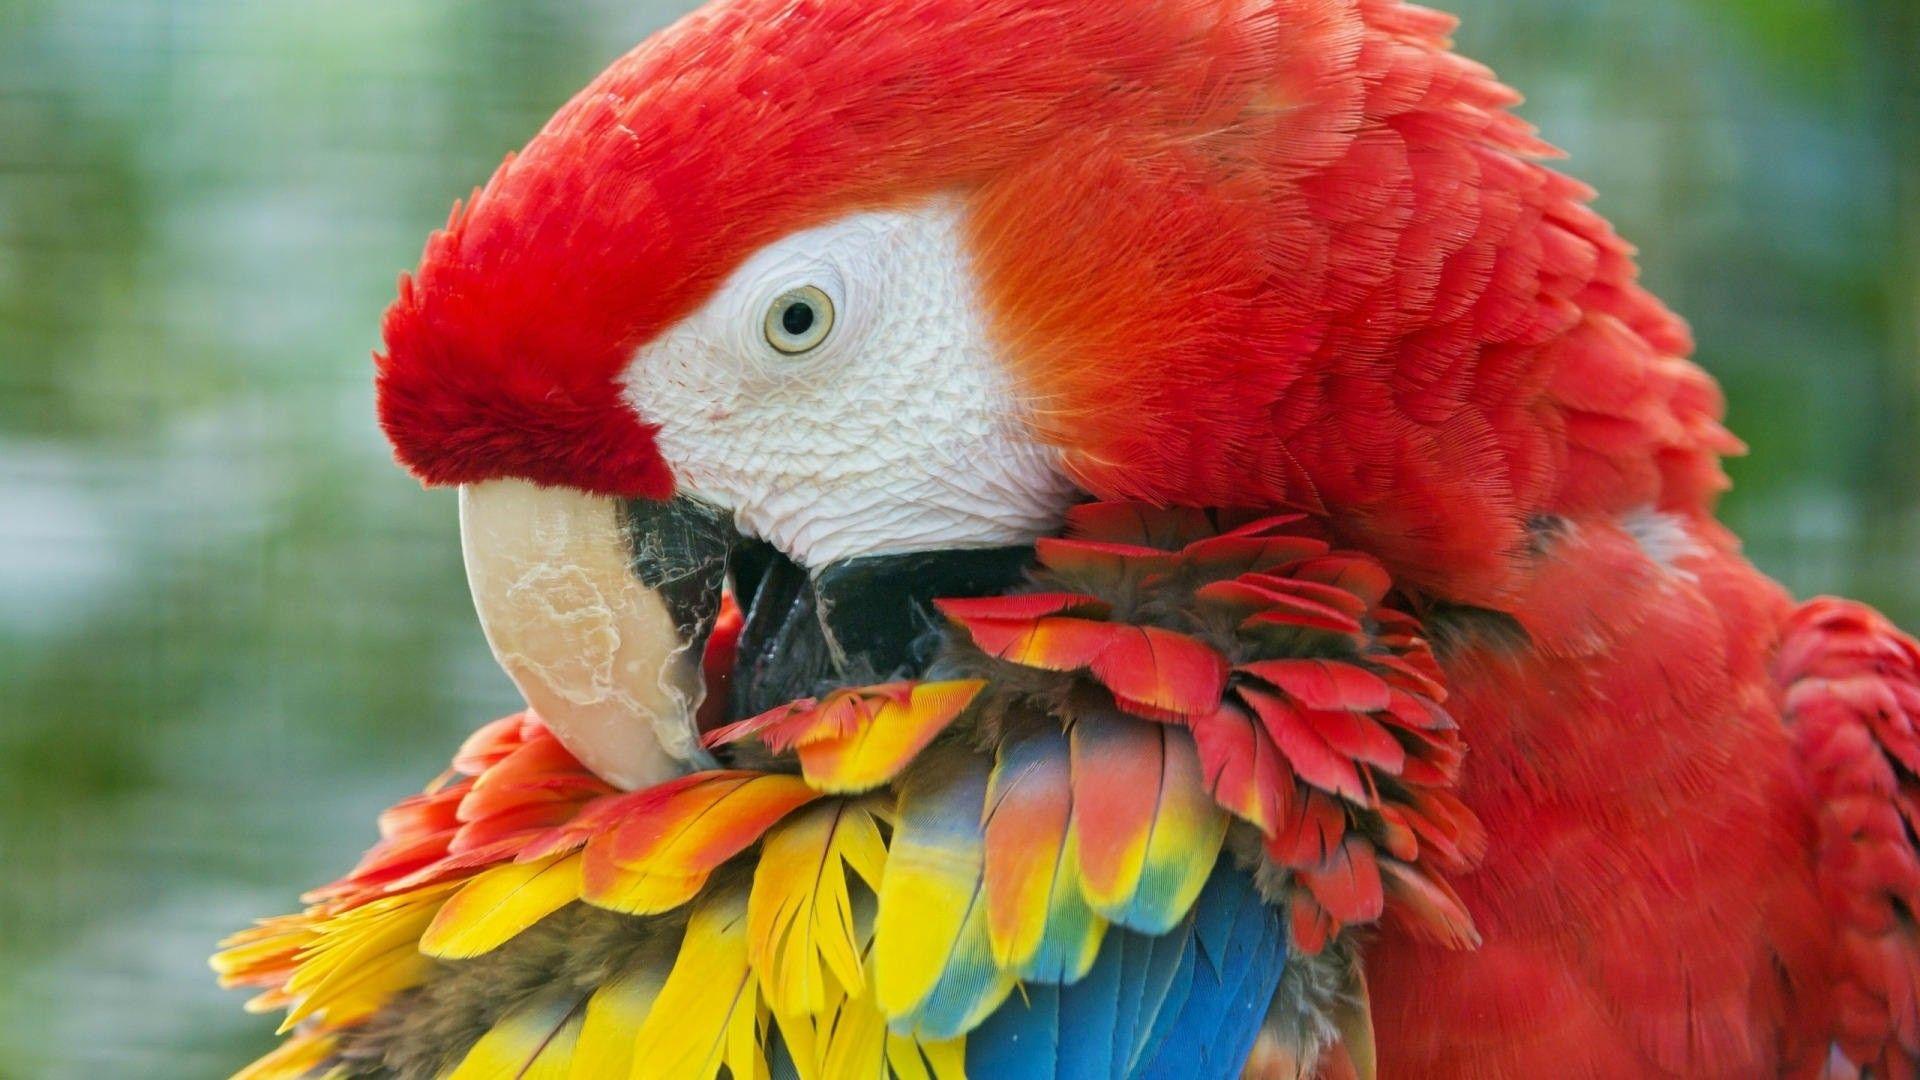 beautiful parrots images download